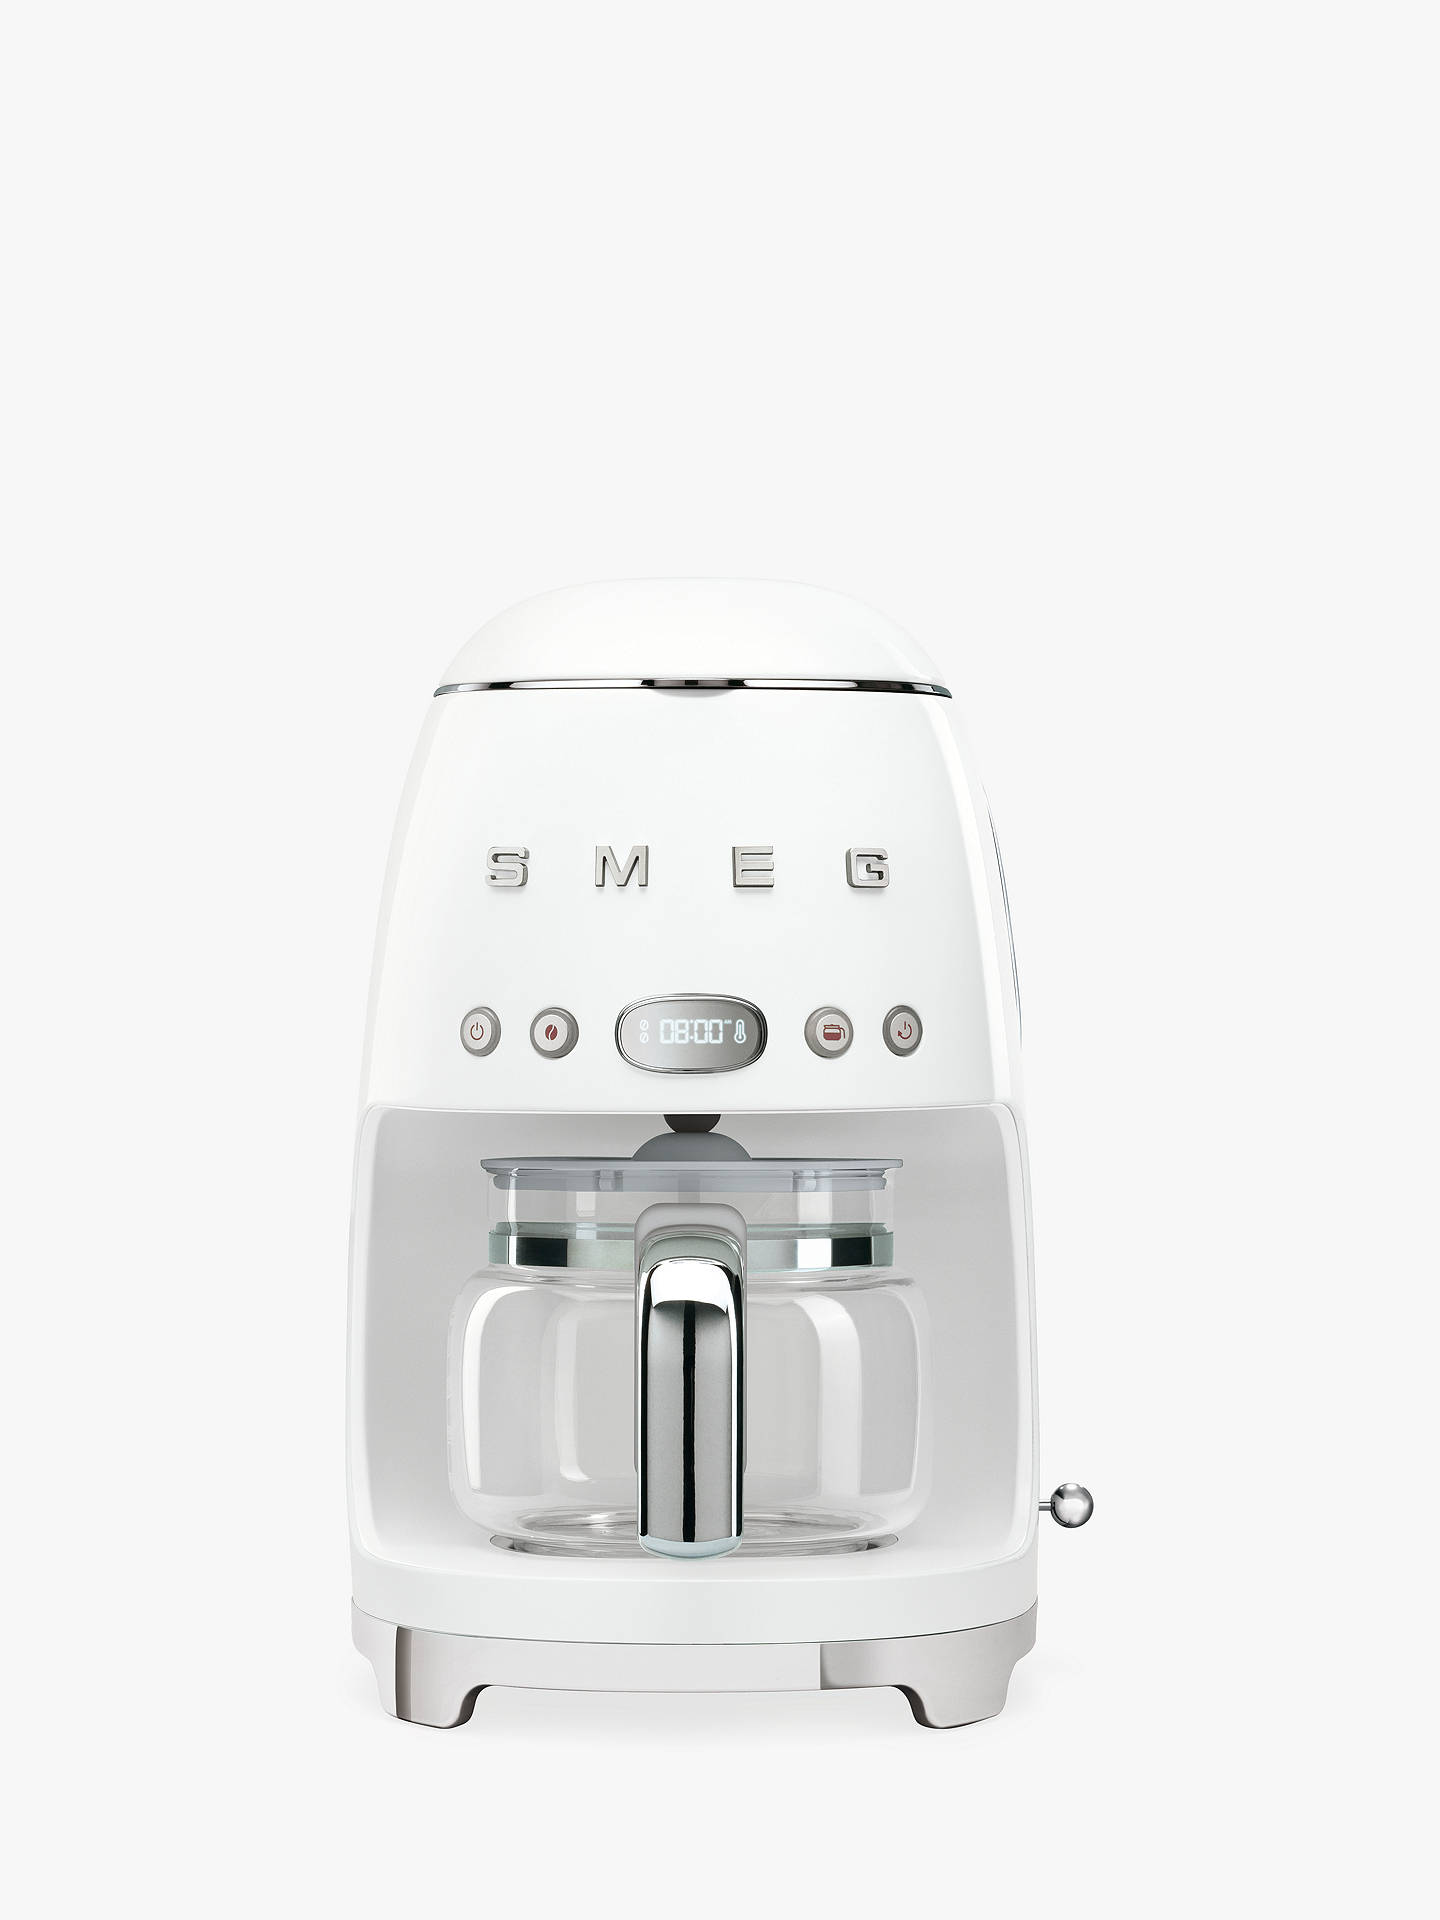 Smeg Dcf01 Drip Filter Coffee Machine White